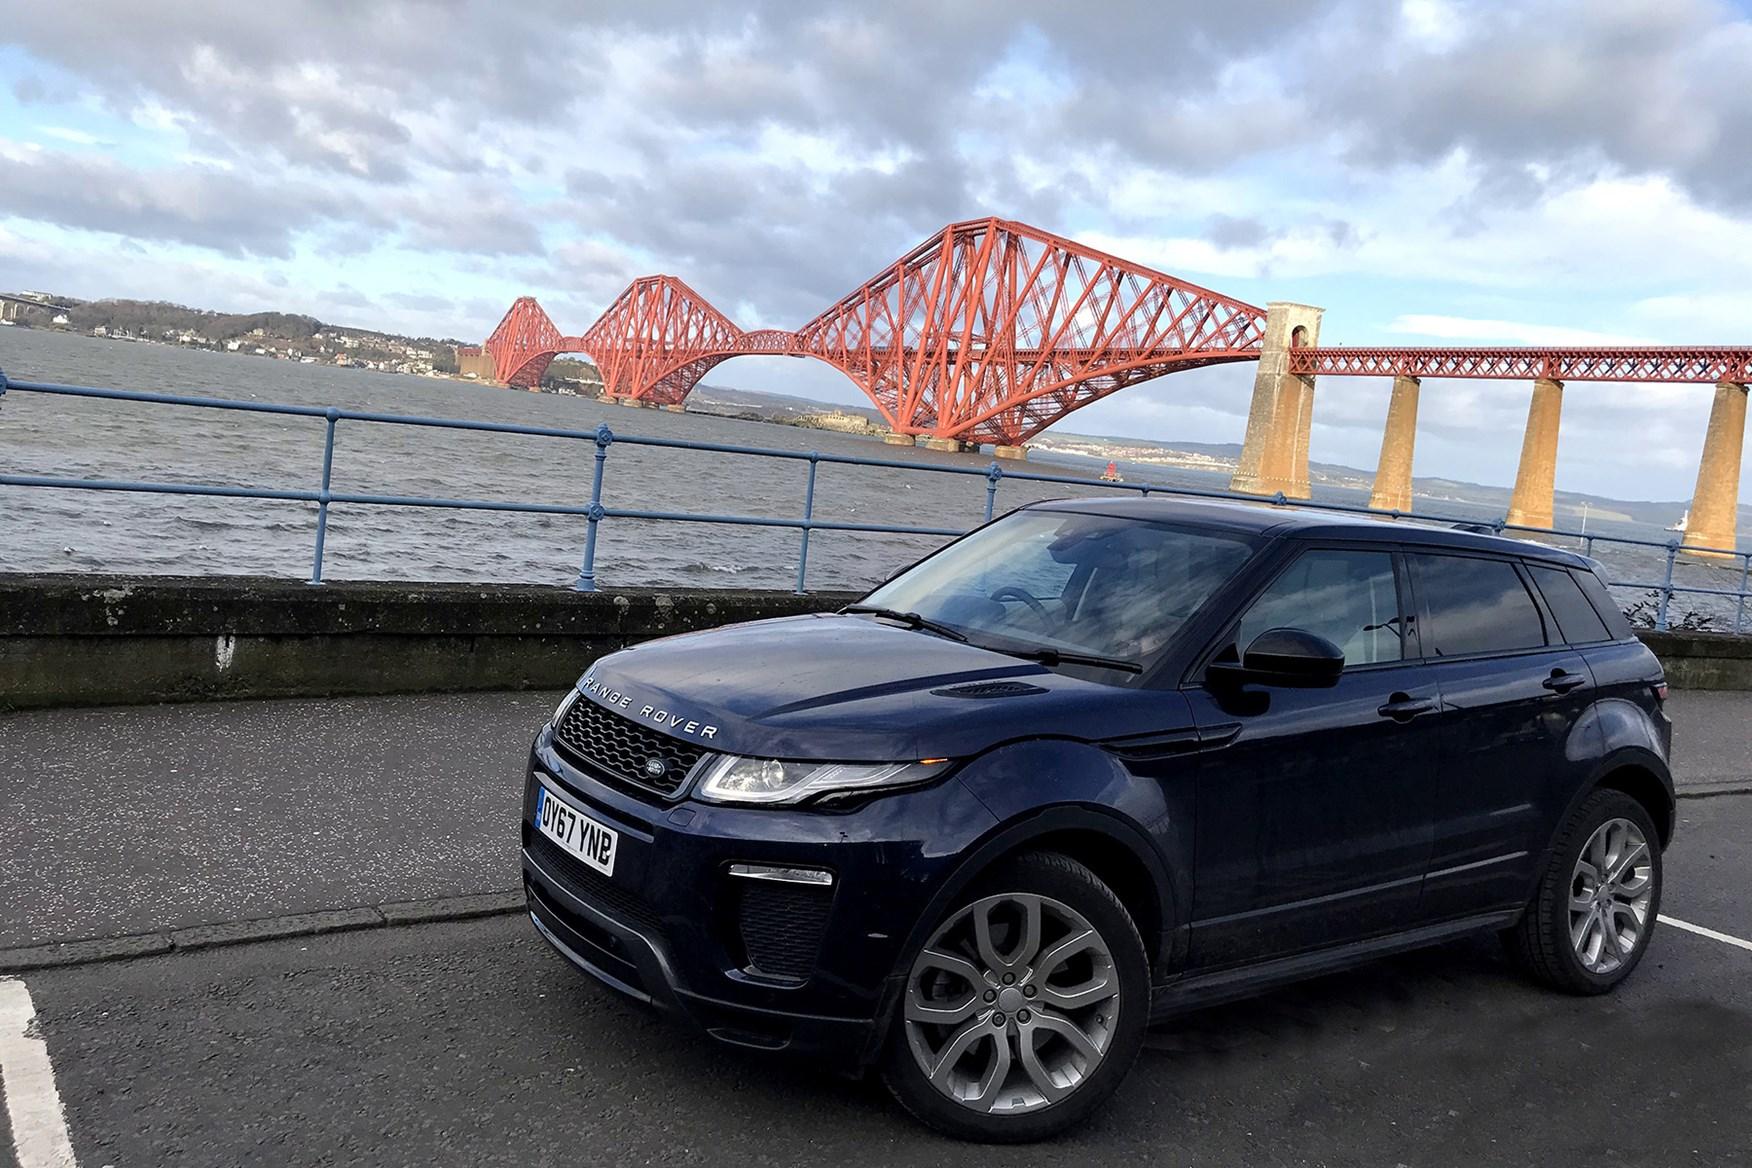 Range Rover Evoque at the Forth Bridge